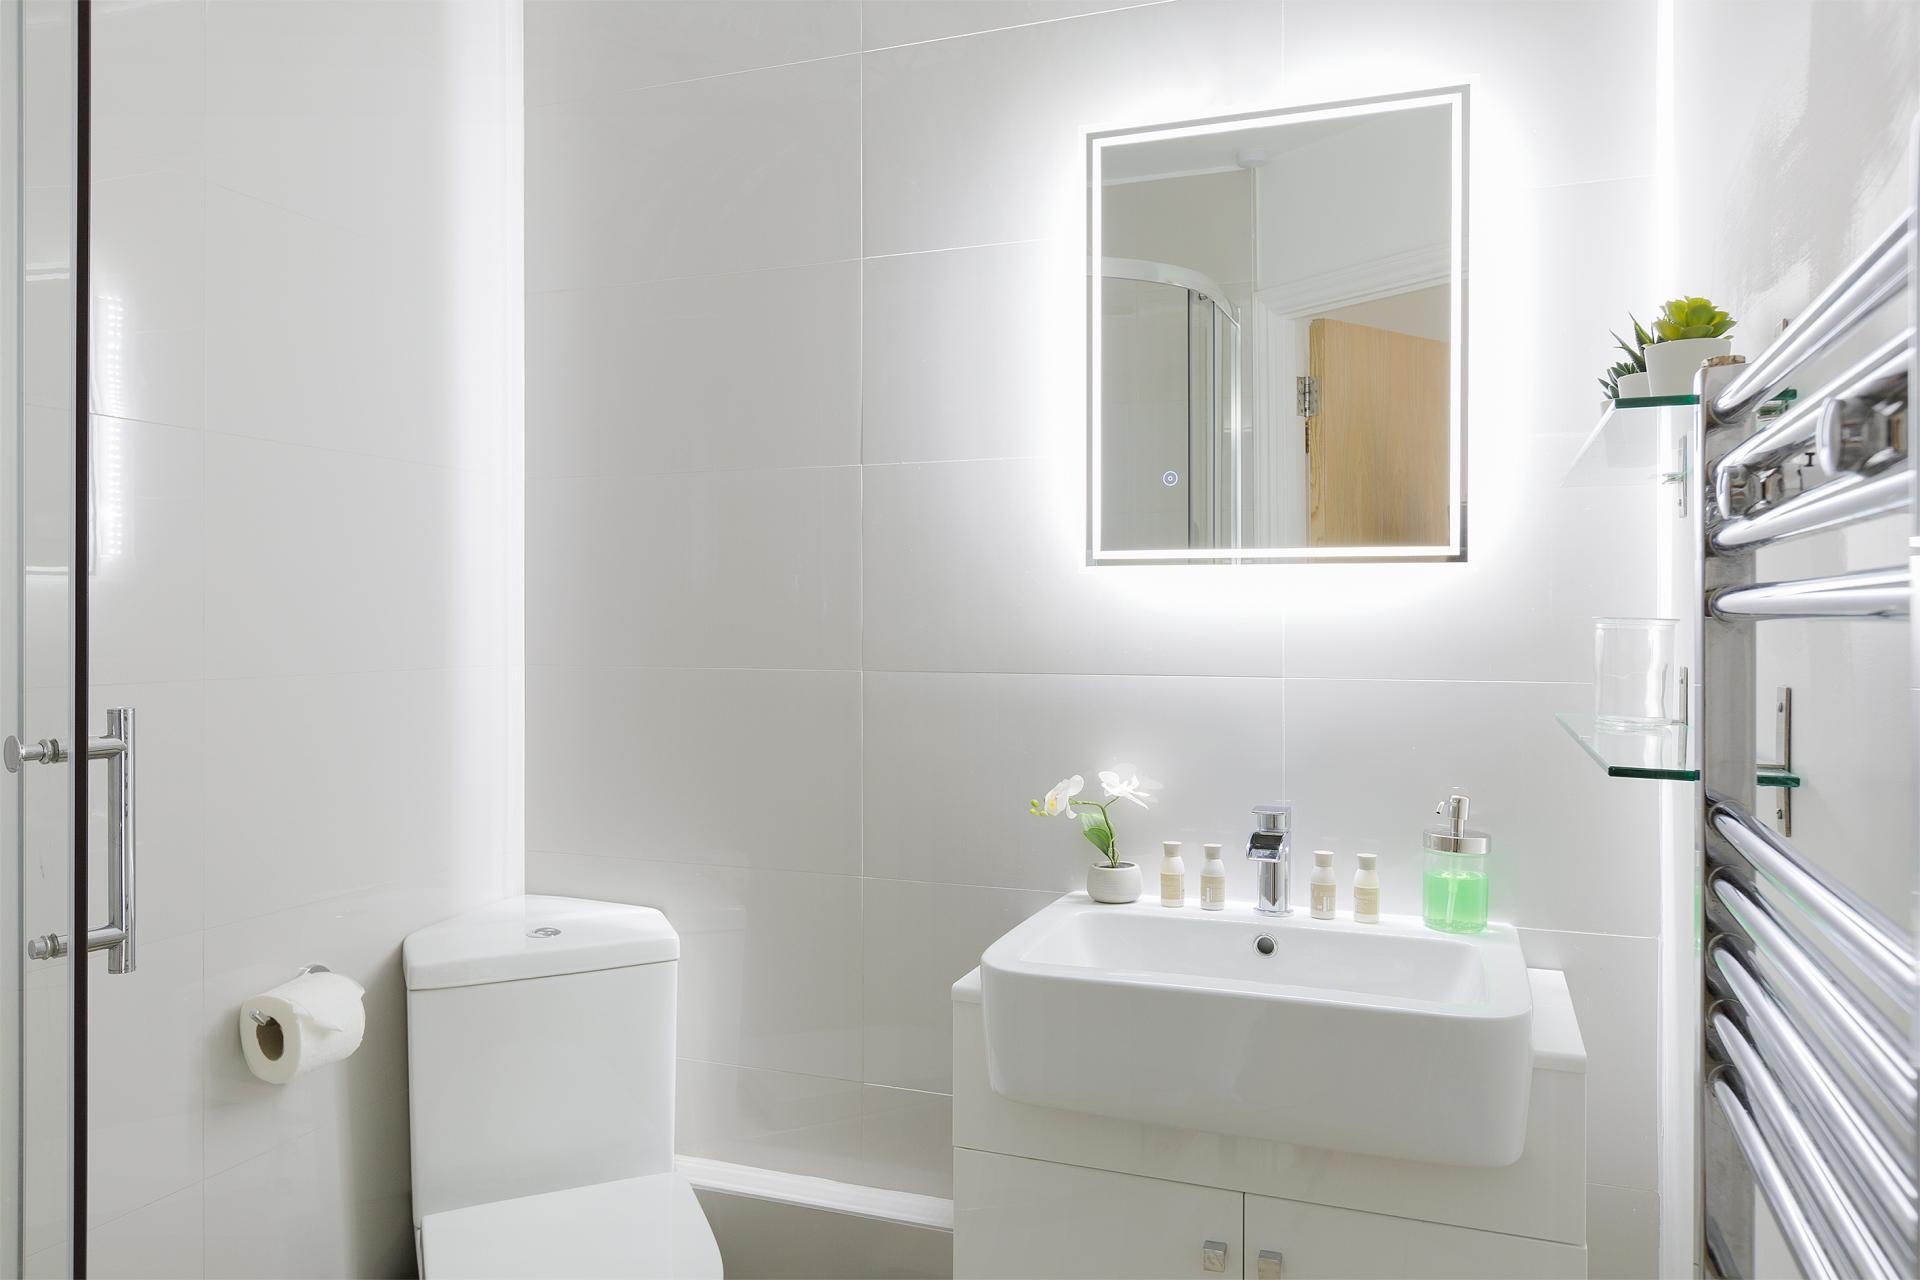 Toilet at Serenity Apartment, Whitechapel, London - Citybase Apartments